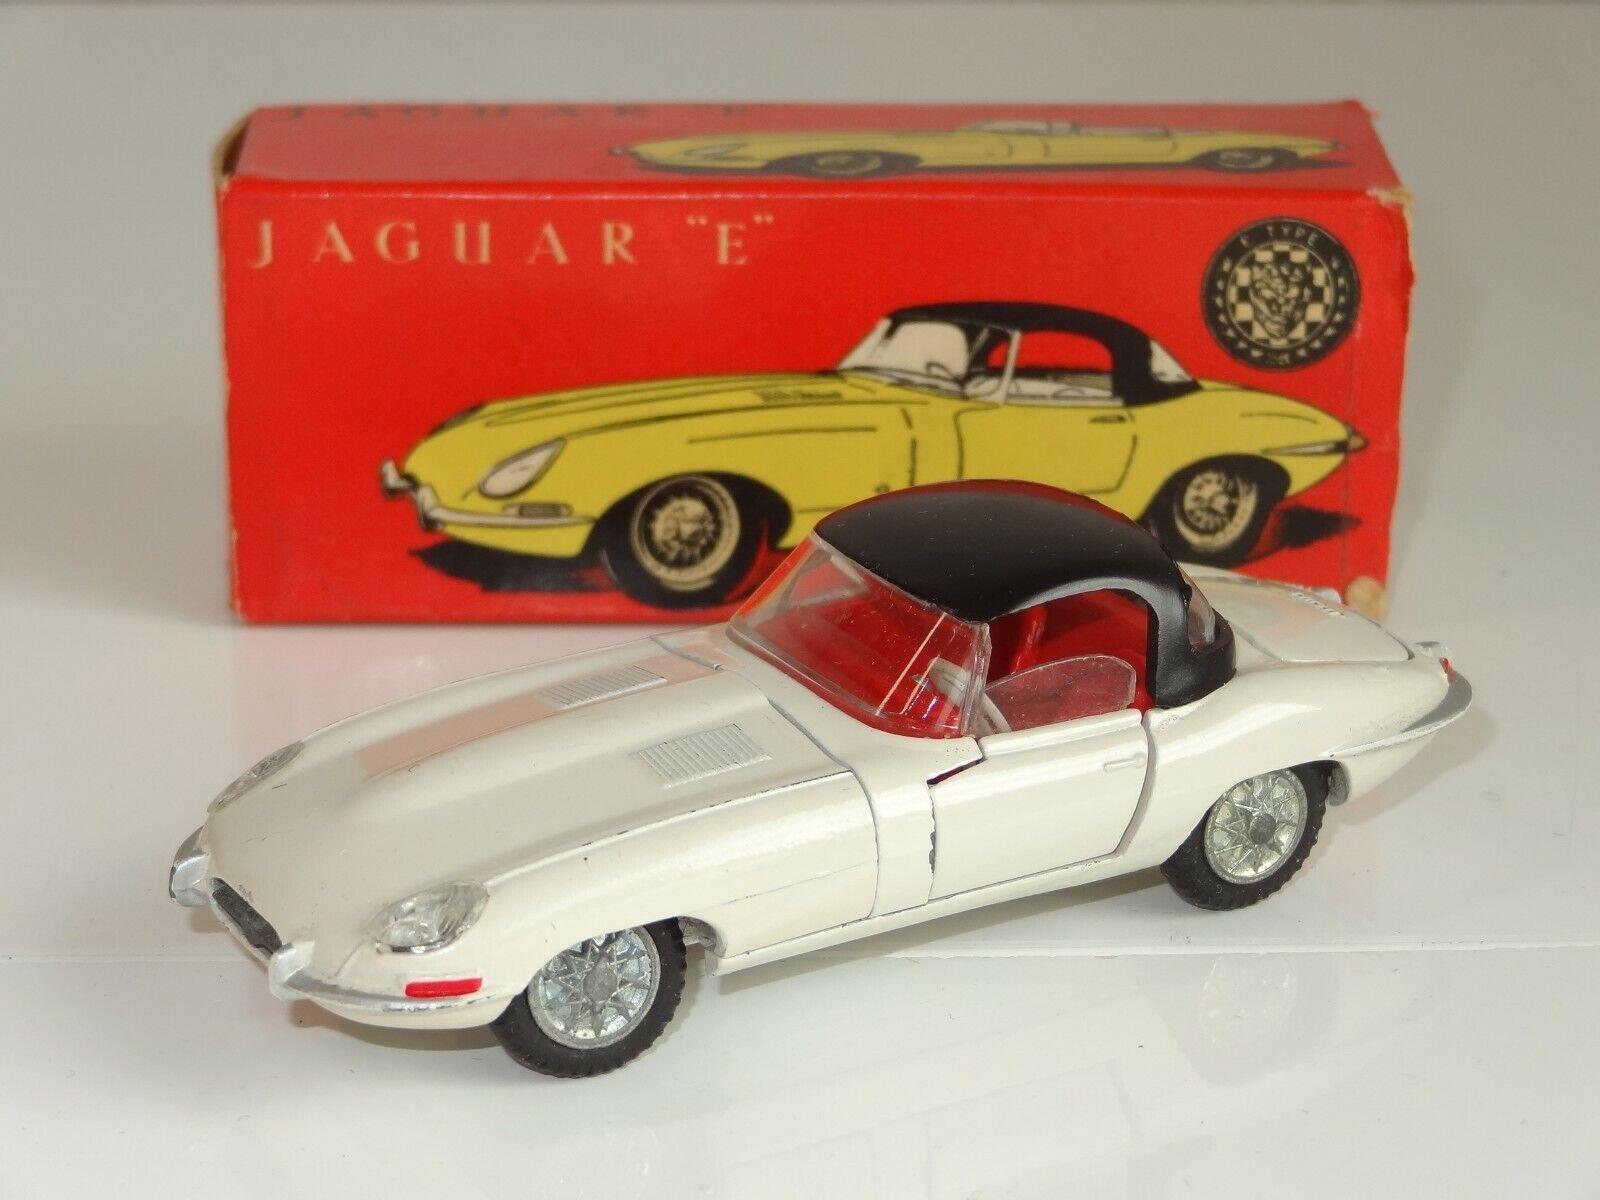 exclusivo (B) (B) (B) Tekno DENMARK Jaguar E Tipo 927  en venta en línea